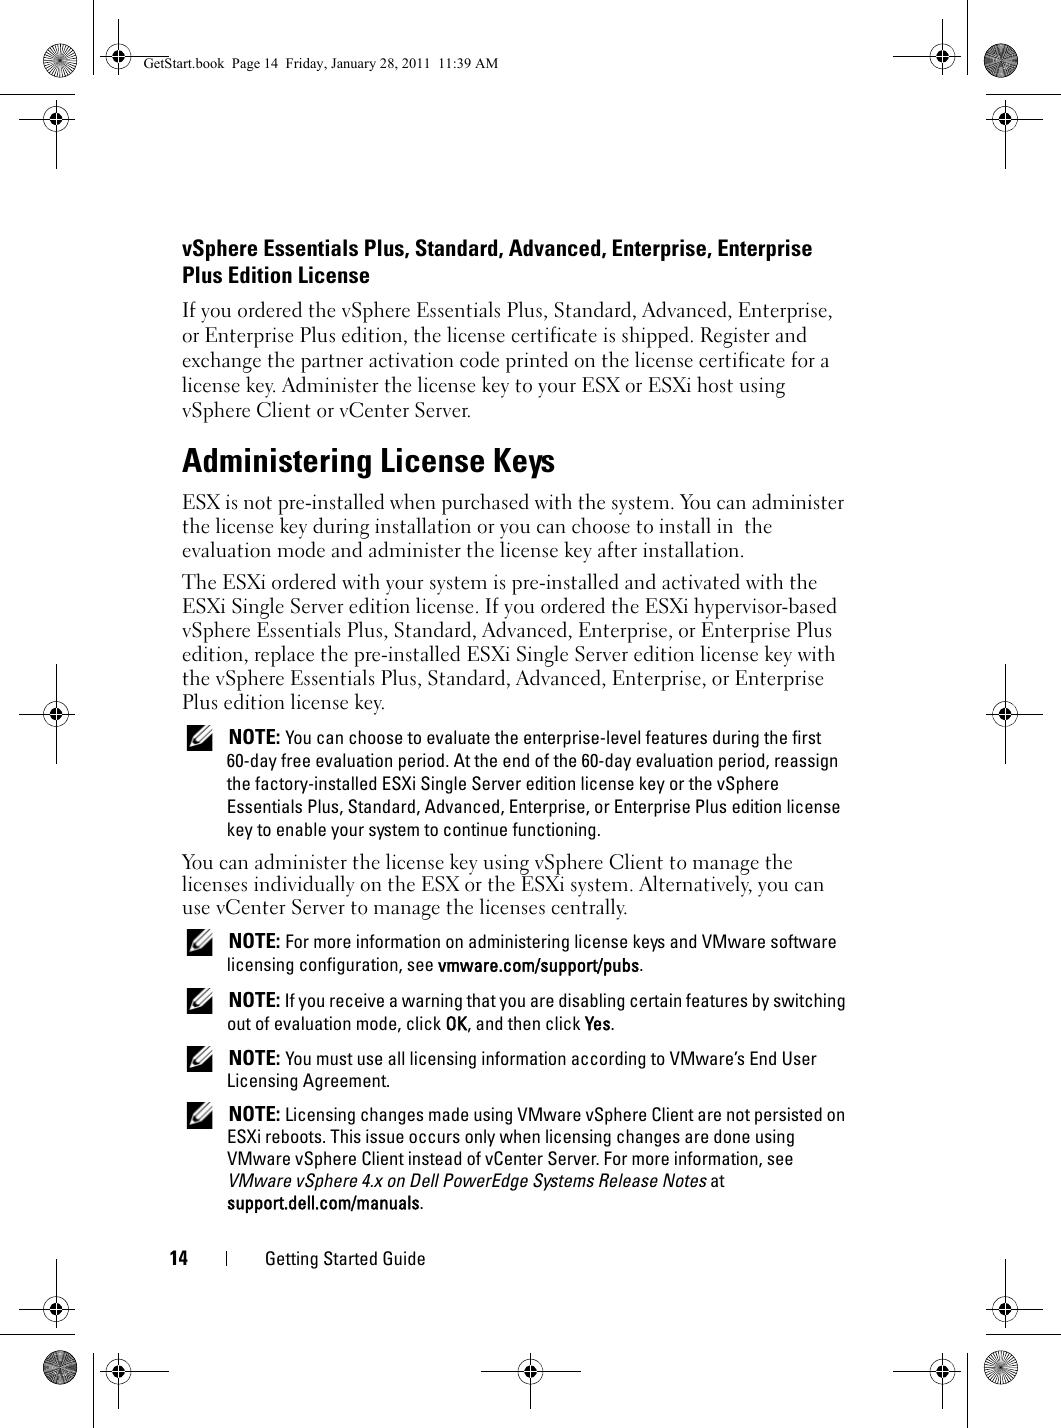 Dell Vmware Esxi 4 X Getting Started Guide VSphere On